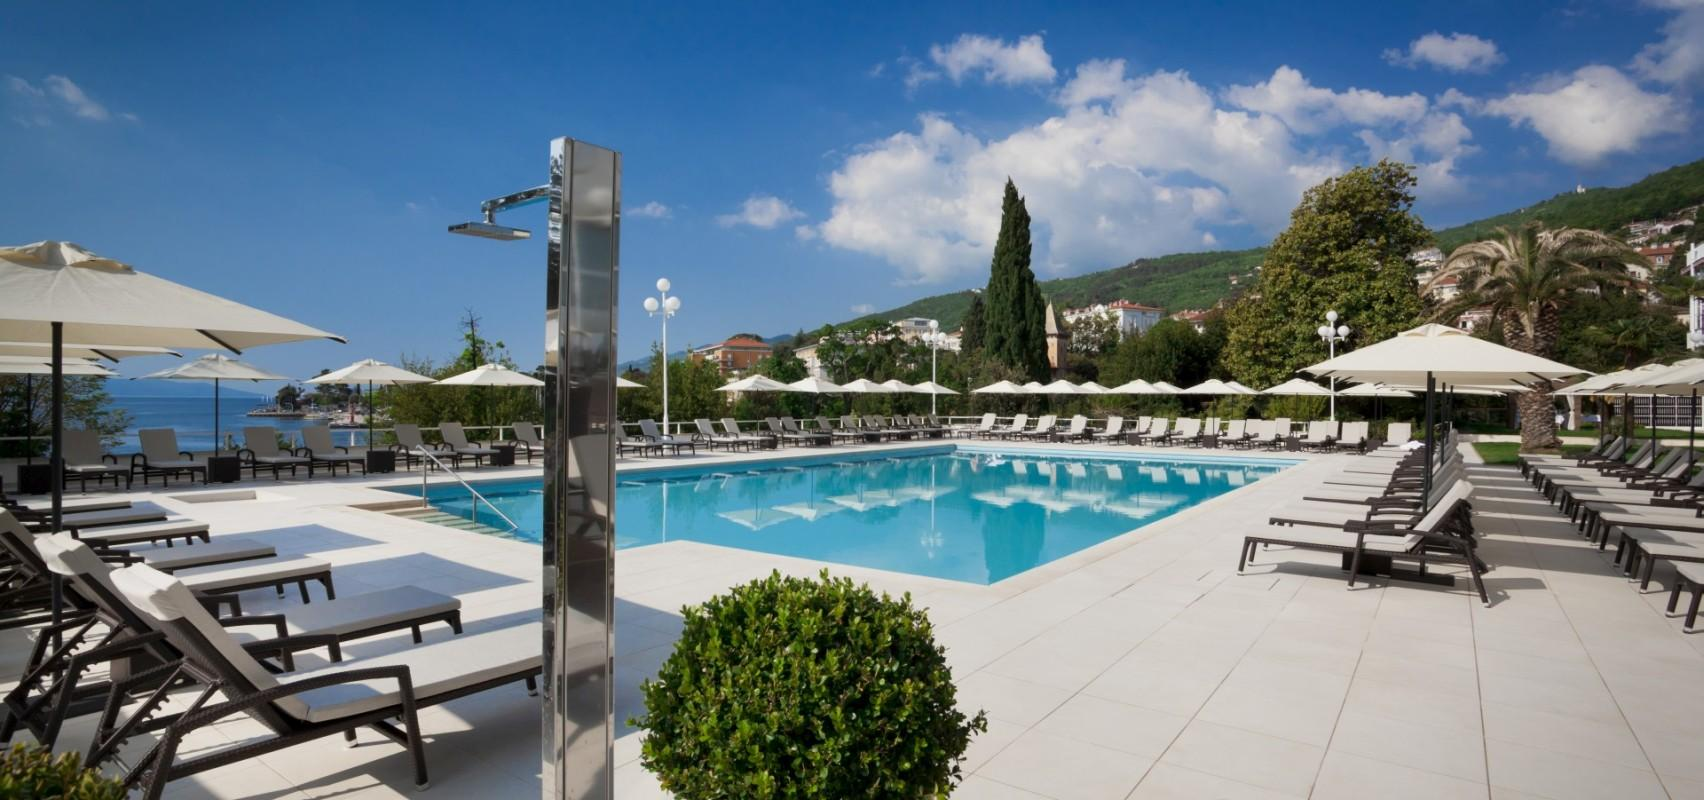 Remisens premium hotel ambassador opatija po itnice for Design hotel 5 sterne